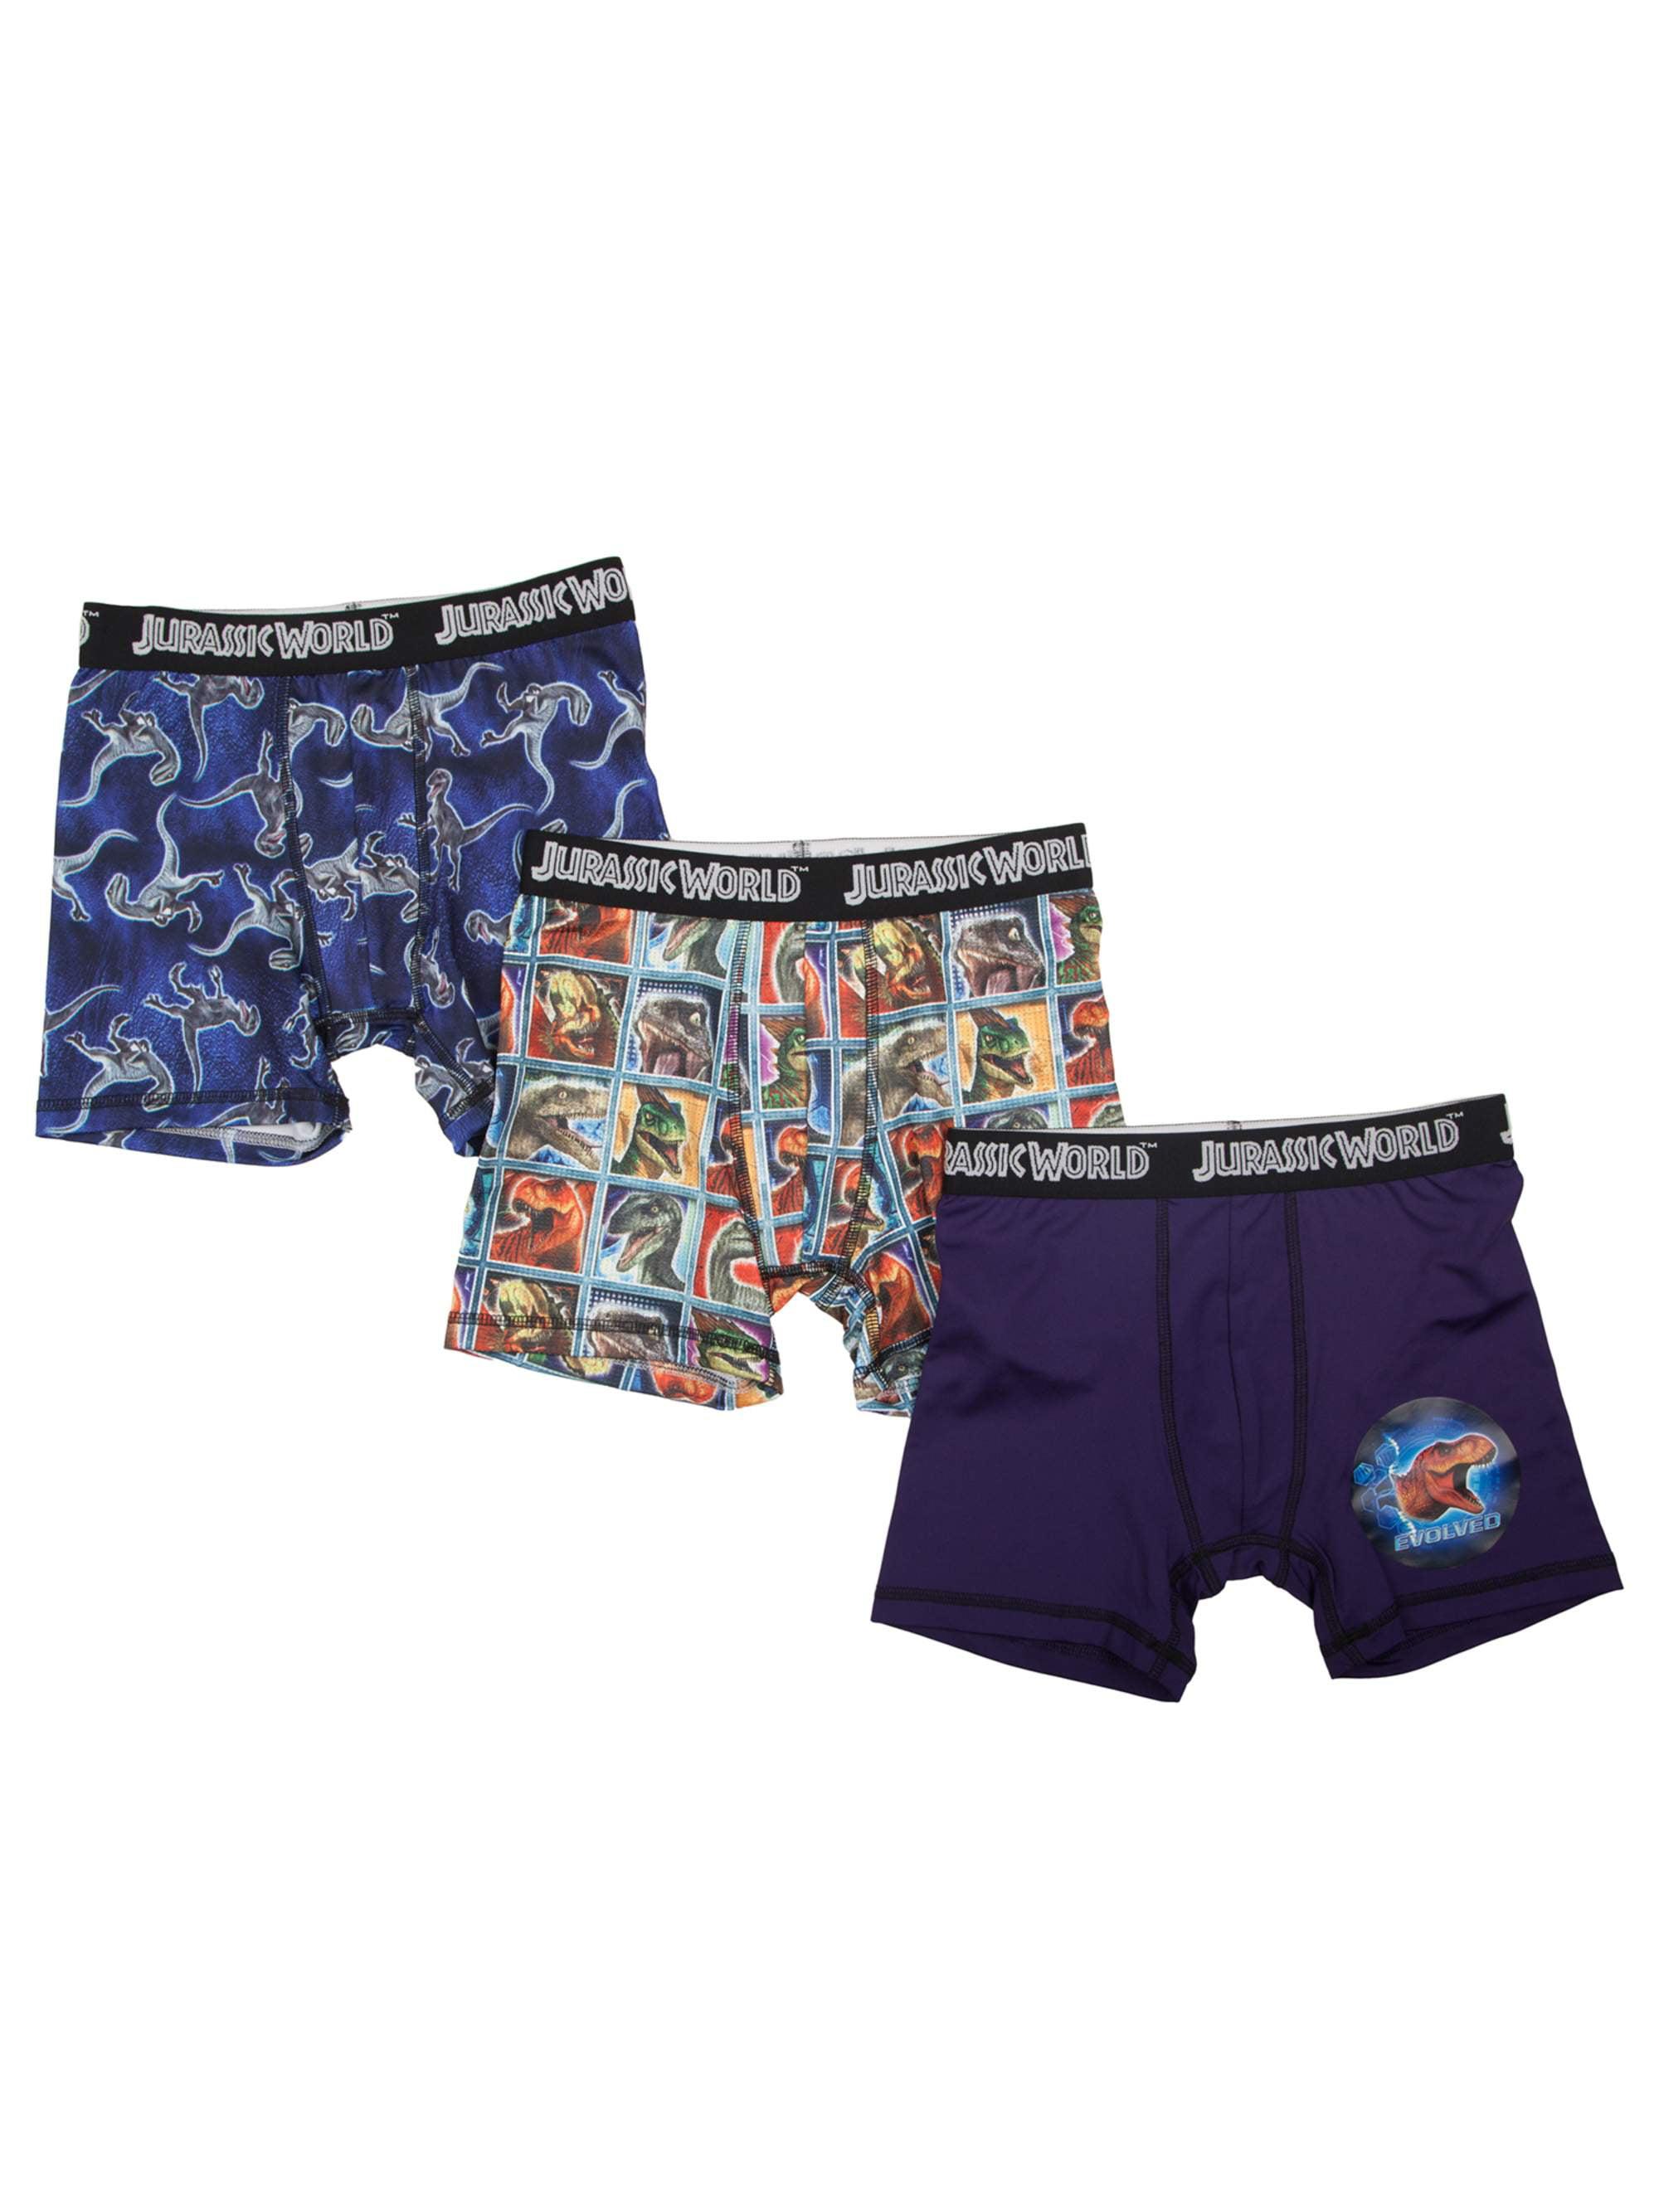 62692ded69 Jurassic World - Boy's Poly Boxer Briefs, 3 Pack - Walmart.com